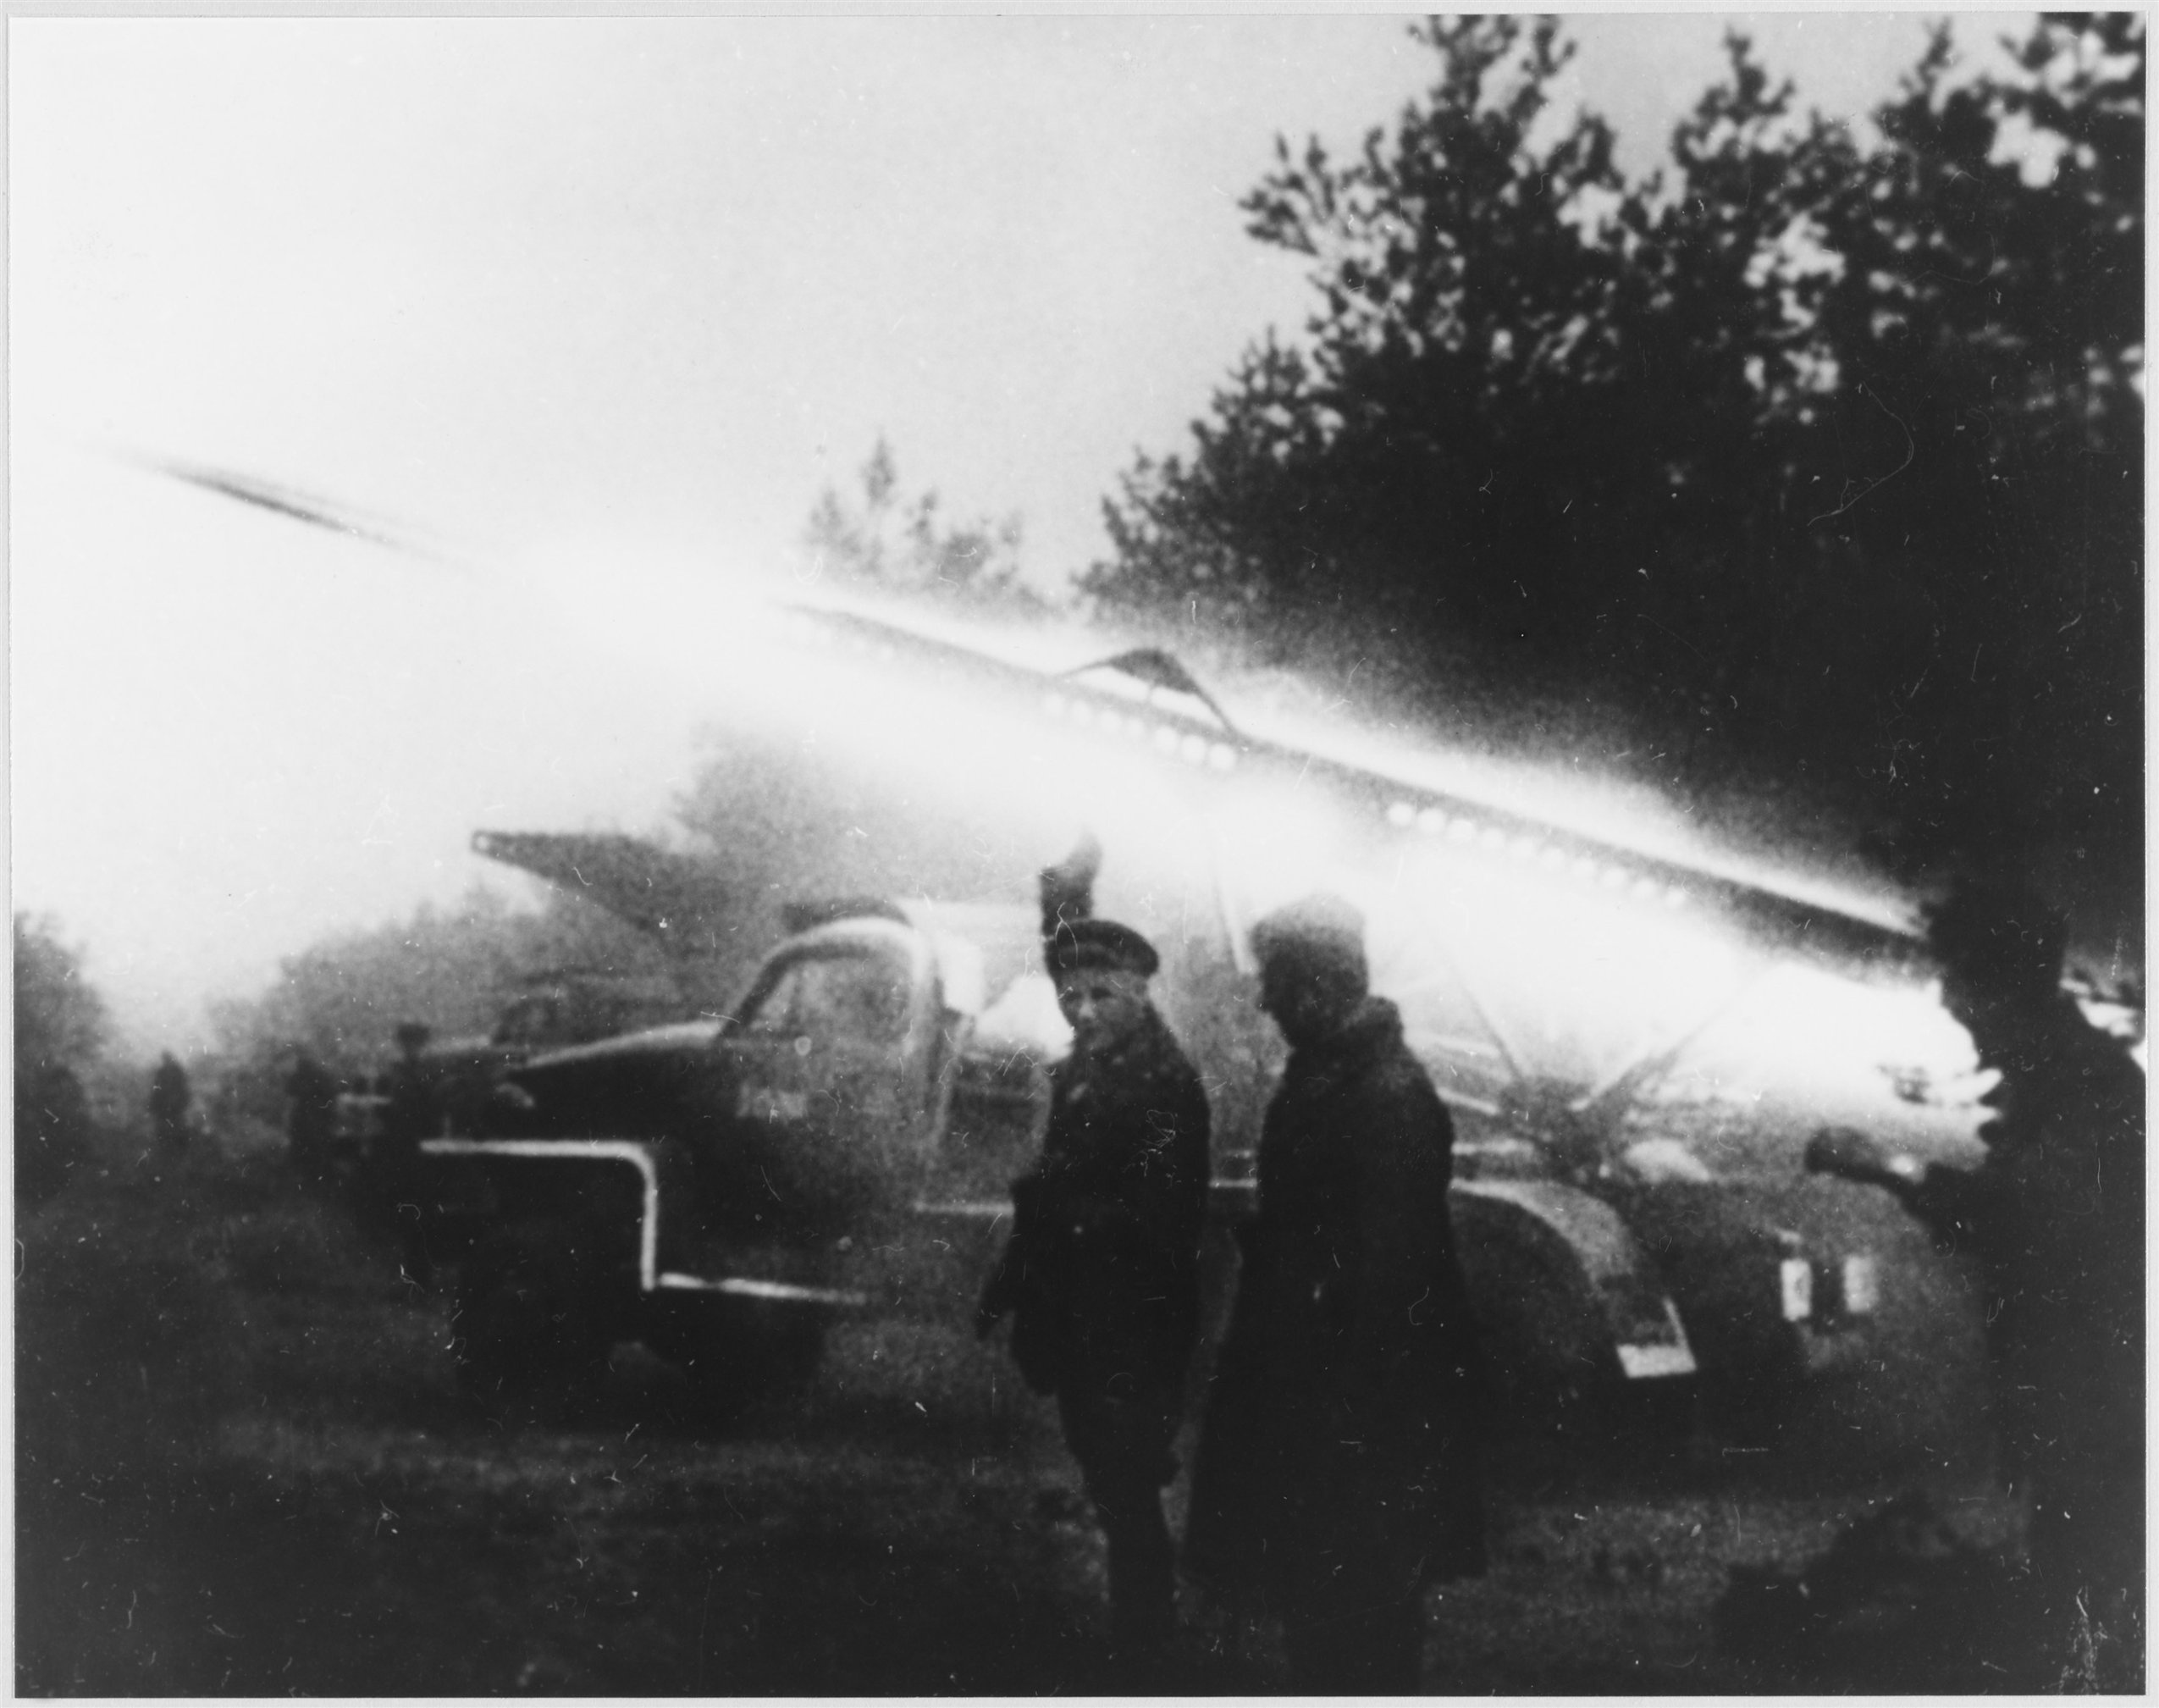 БМ-13 в Белоруссии, 1941 год.